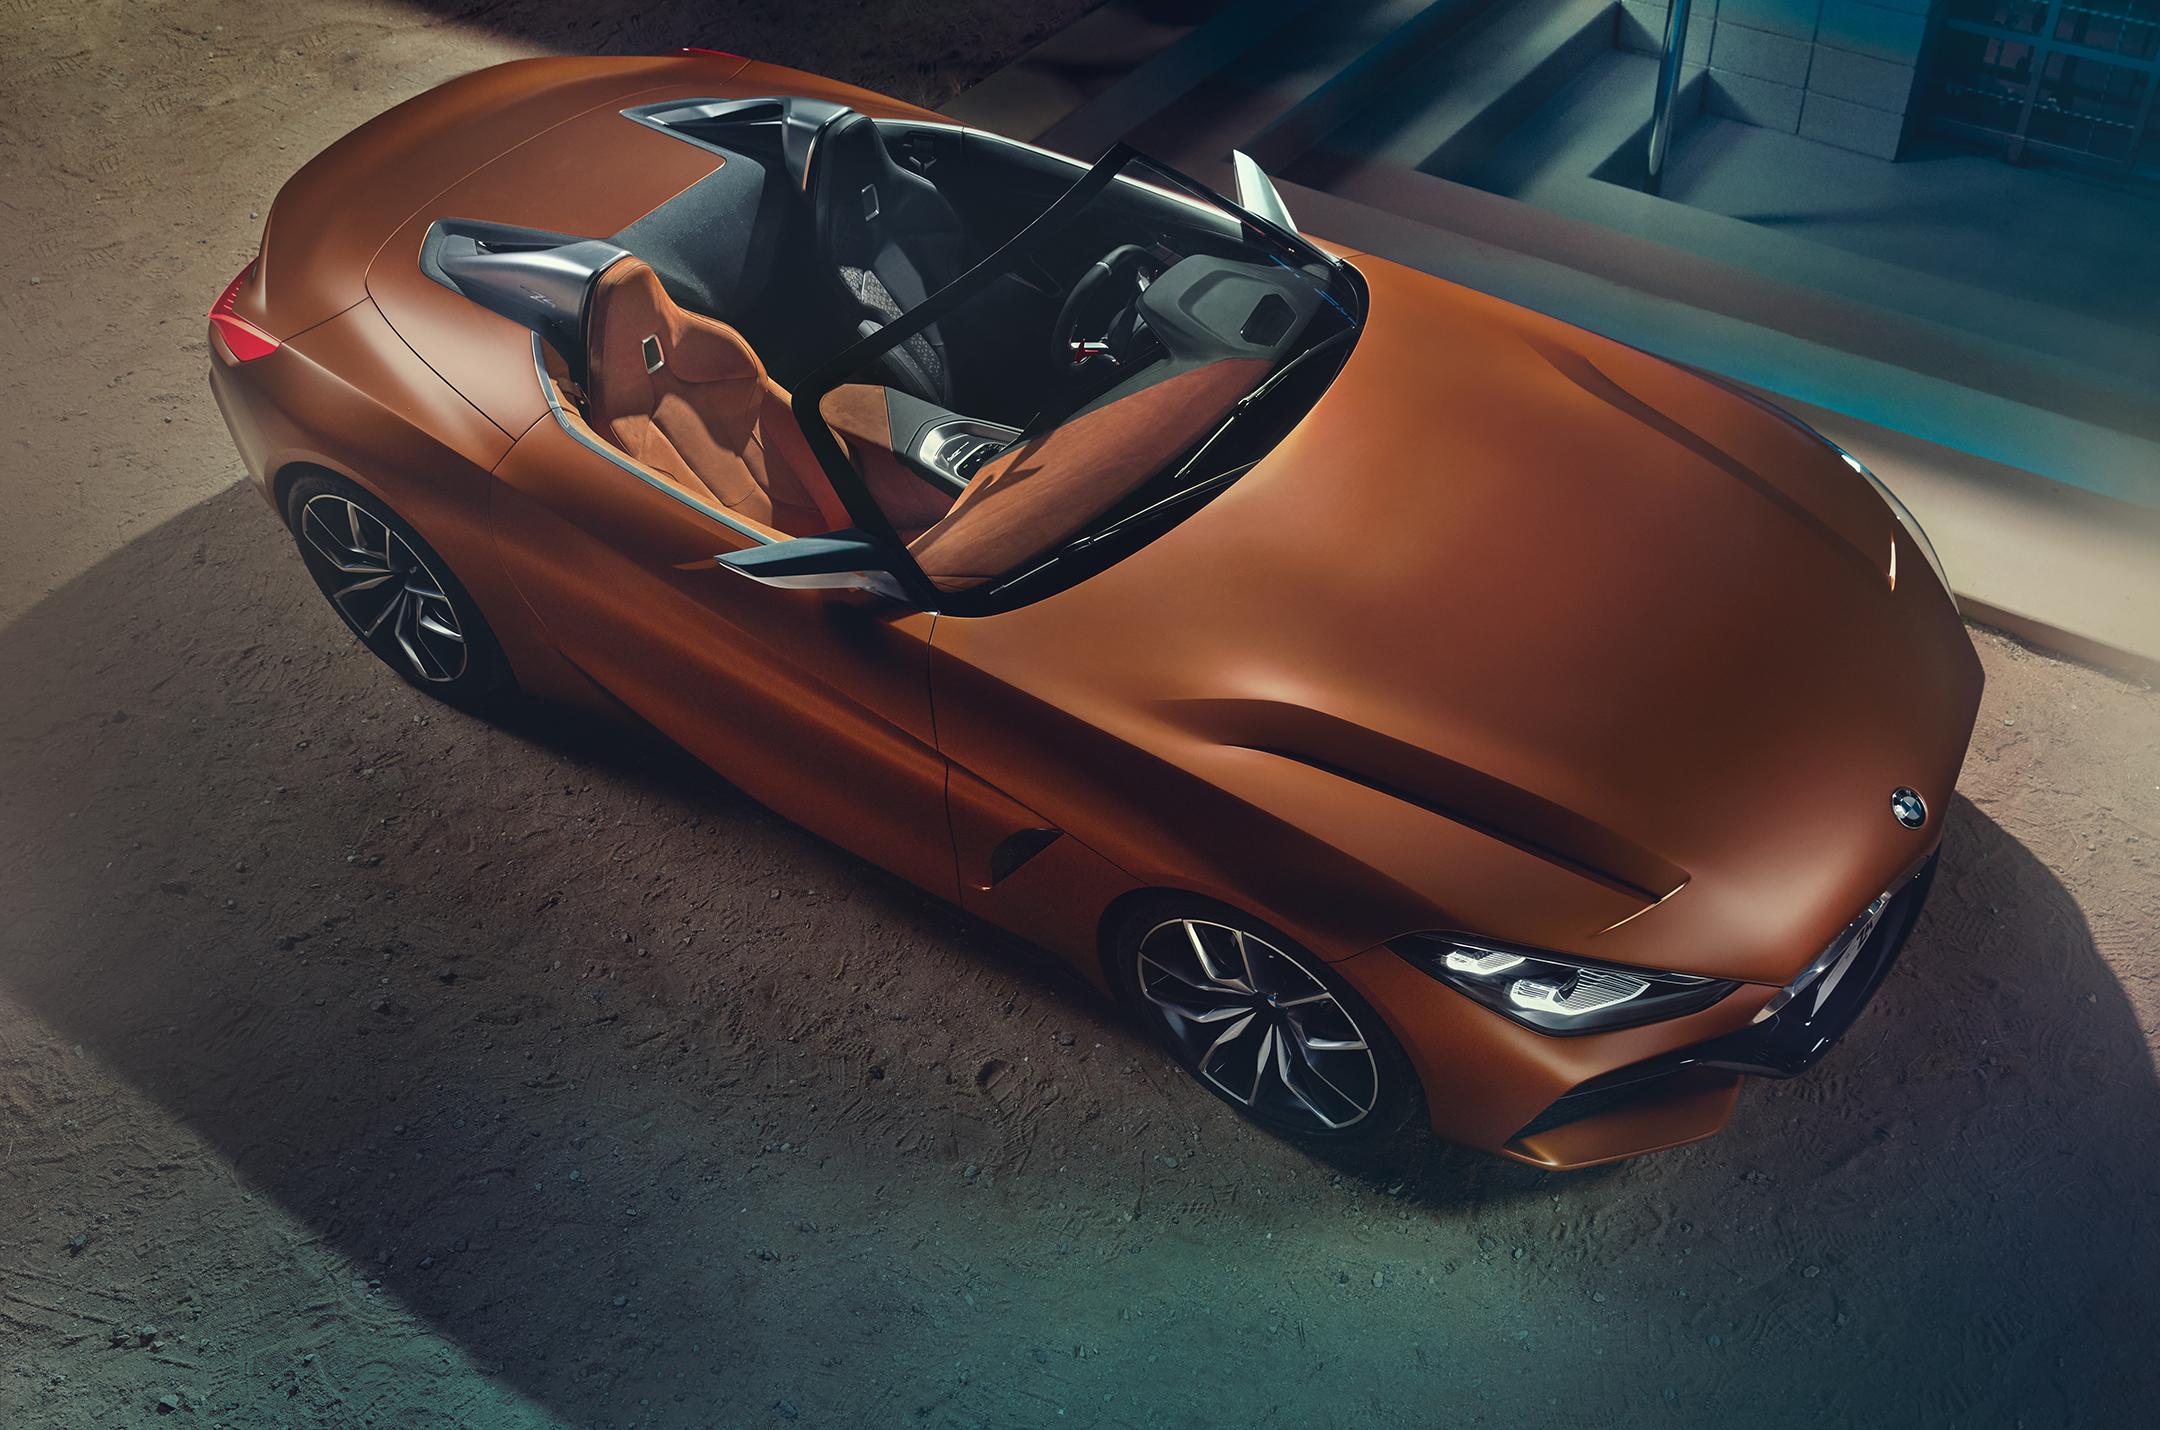 BMW Concept Z4 - 2017 - top view